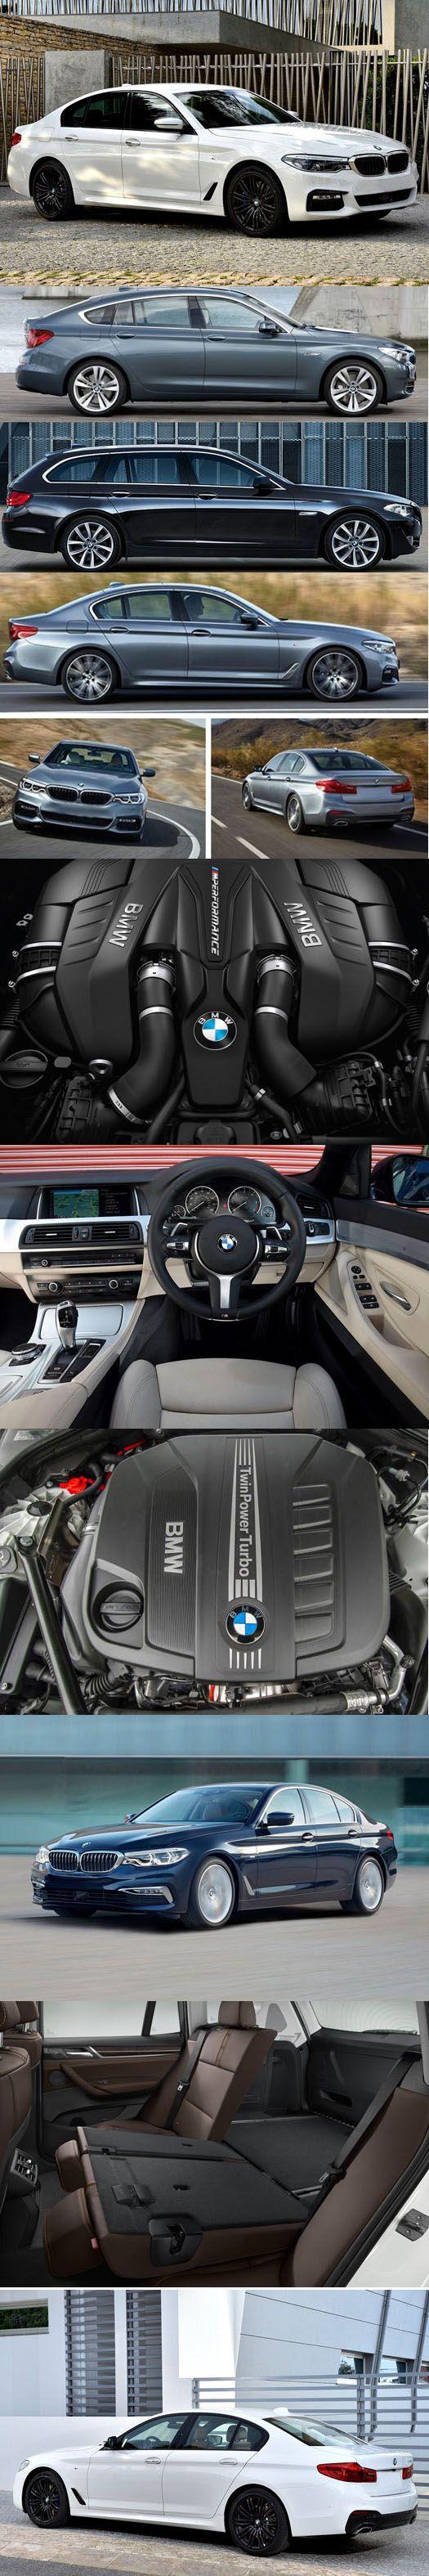 BMW 5 Series Engine is Breathtaking #BMW #BMW5Series #BMW5SeriesEngine For blog: www.engines4sale.co.uk/blog/bmw-5-series-engine-is-breathtaking/